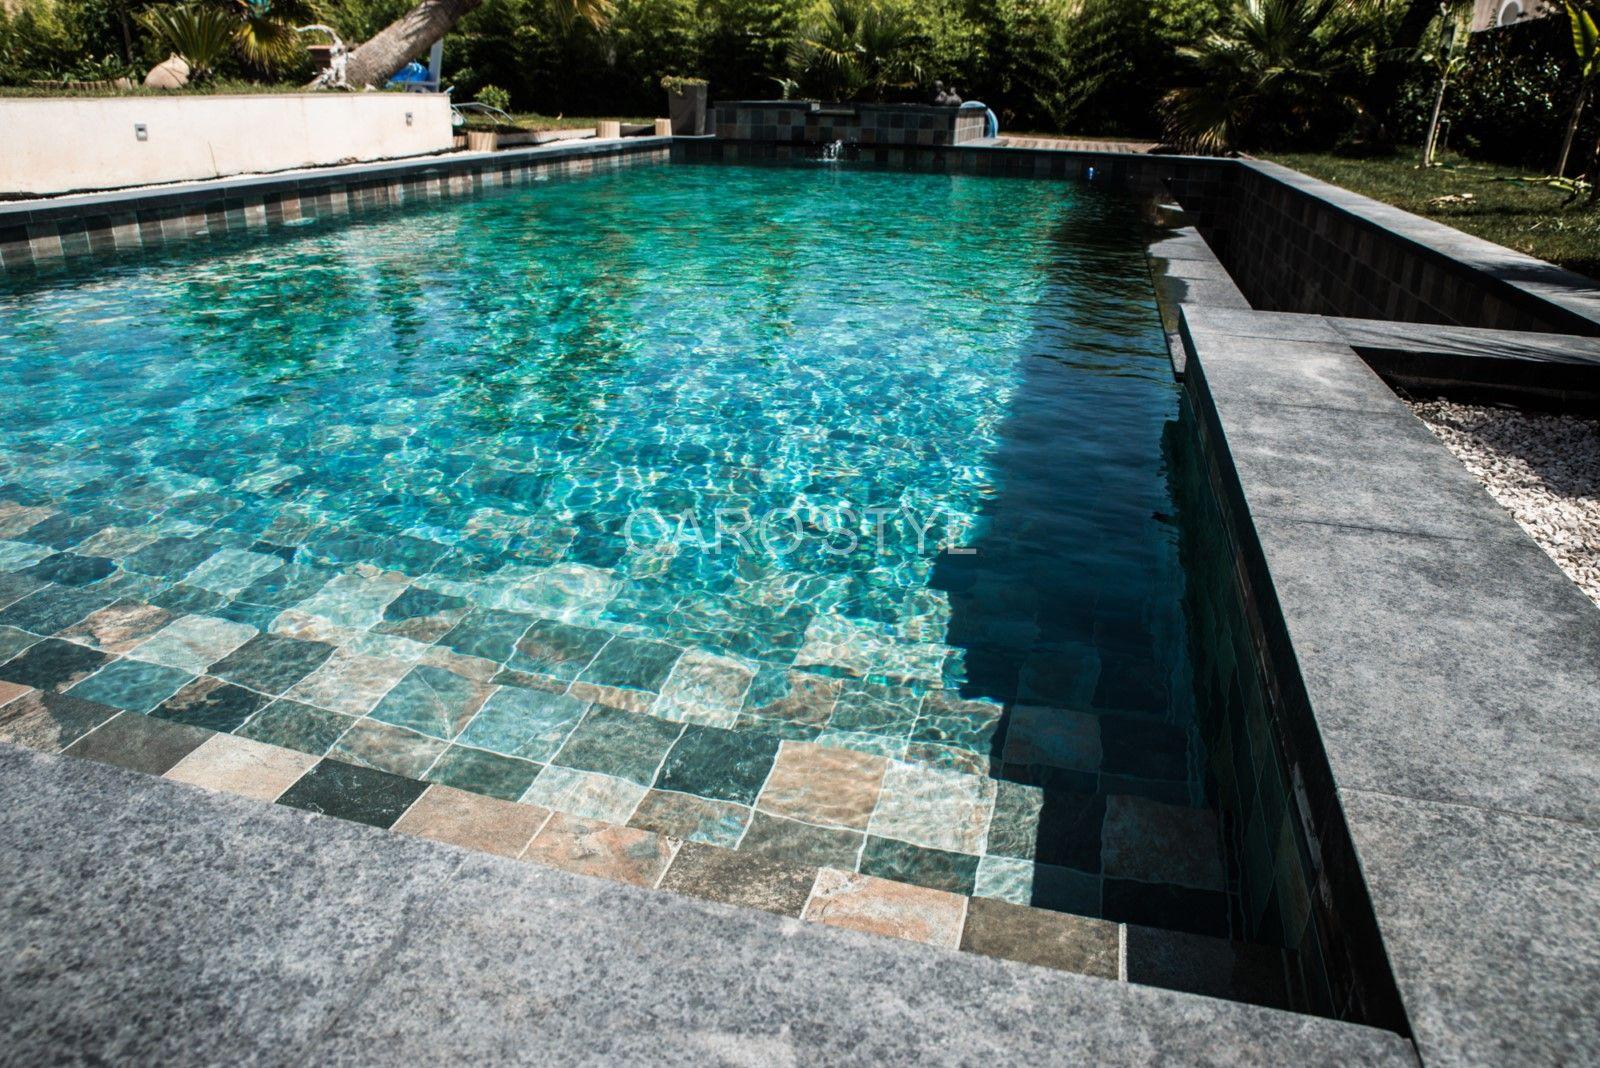 Piscine en pierre verte de bali pr s de tourtour 83 var - Contour de piscine en pierre ...